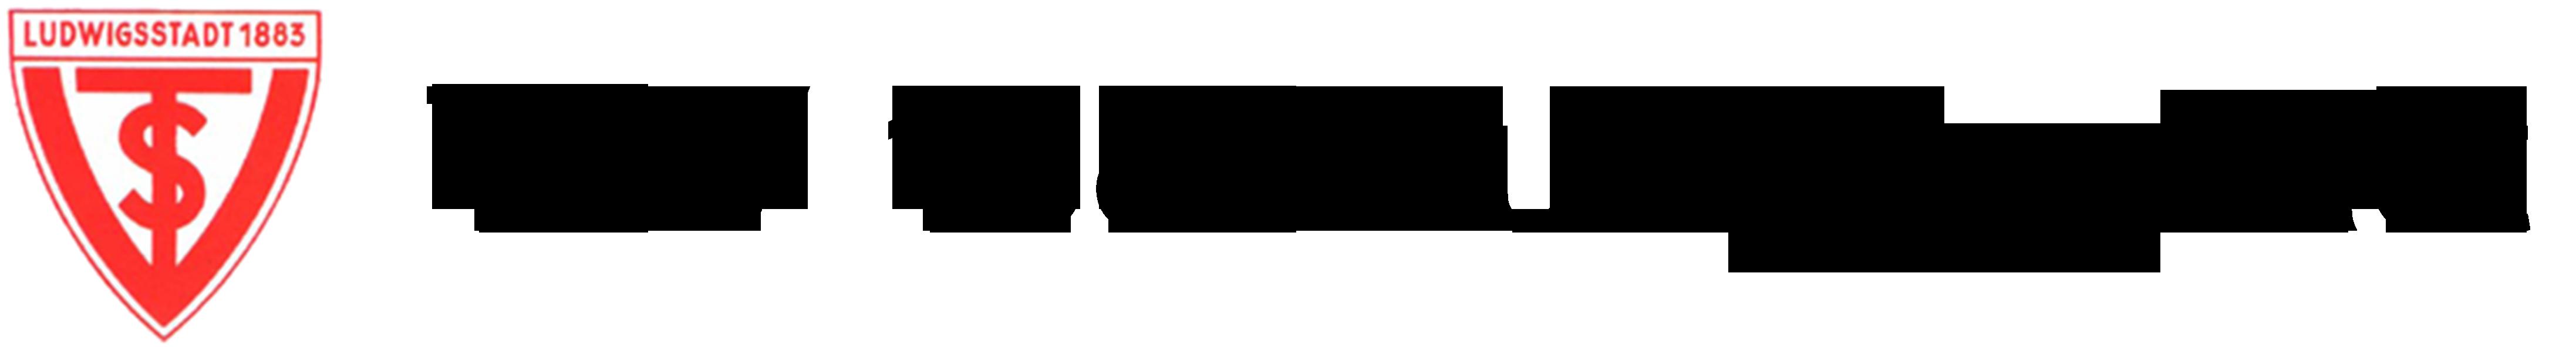 TSV 1883 Ludwigsstadt